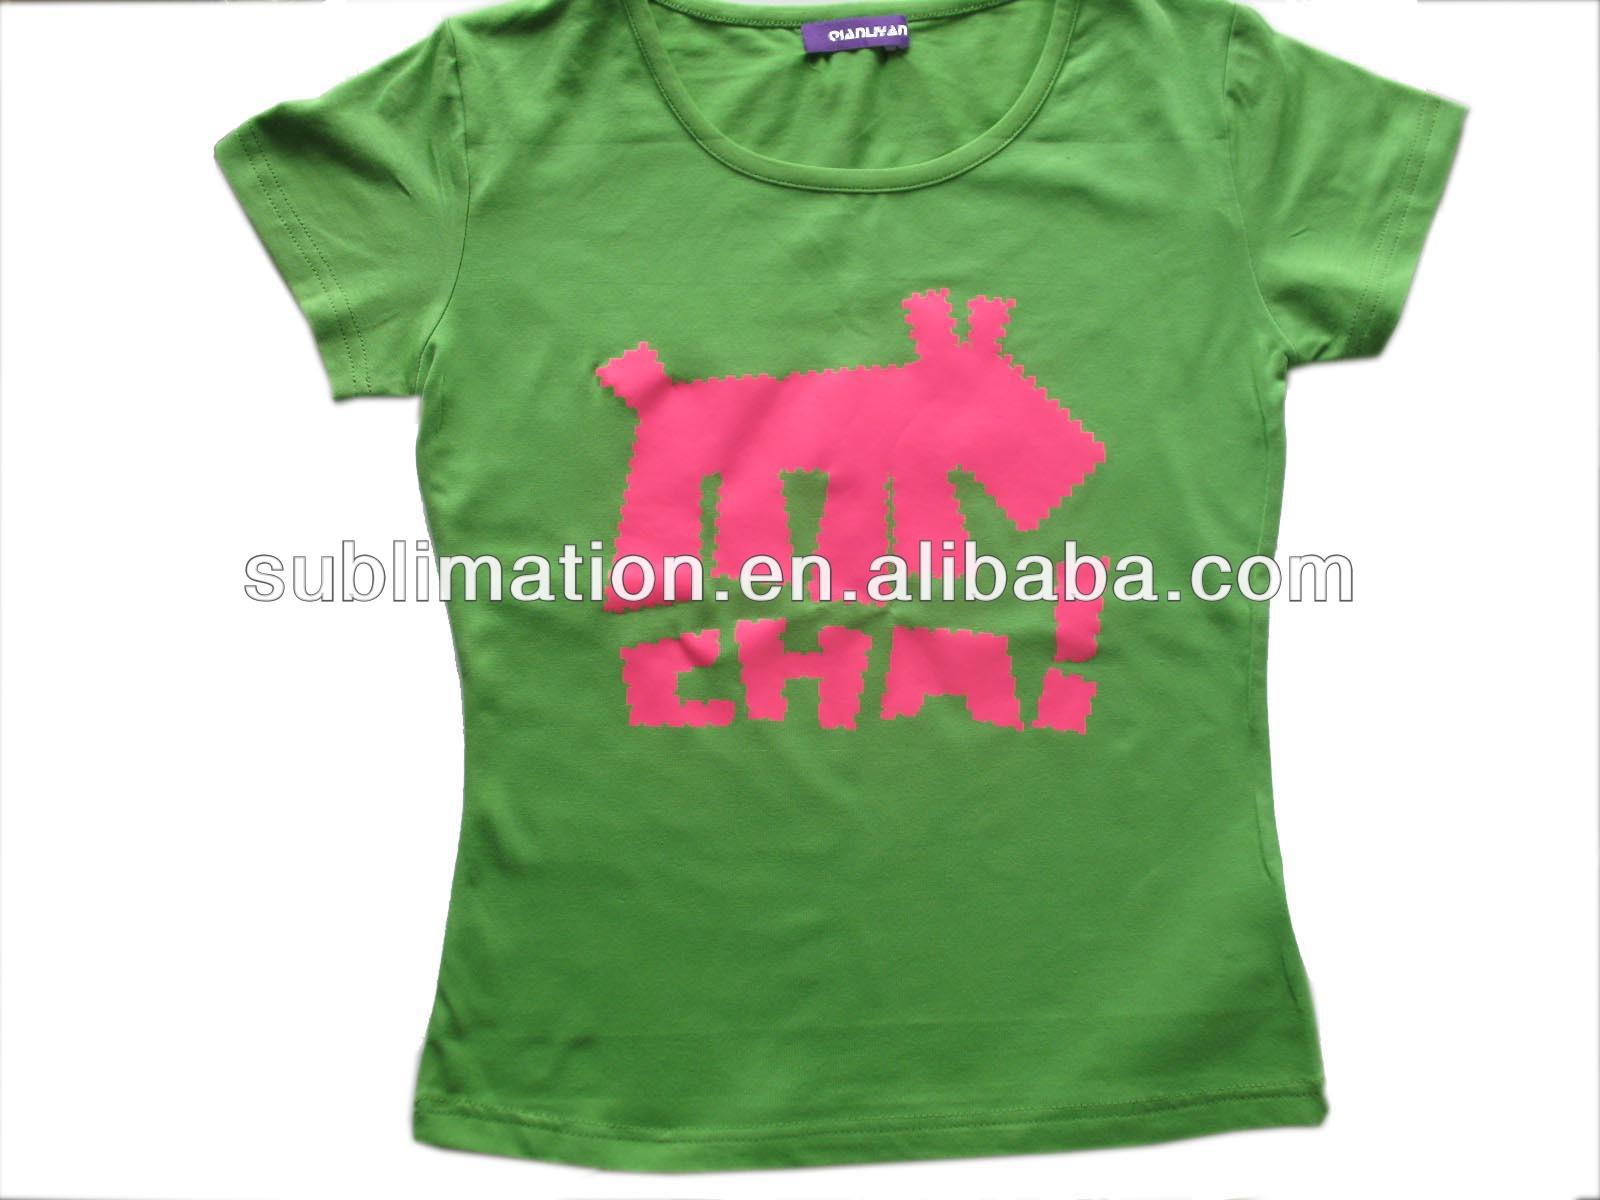 Black t shirt transfer paper - Cotton T Shirt Flock Badge Paper Sublimation Paper Sublimation Black T Shirt